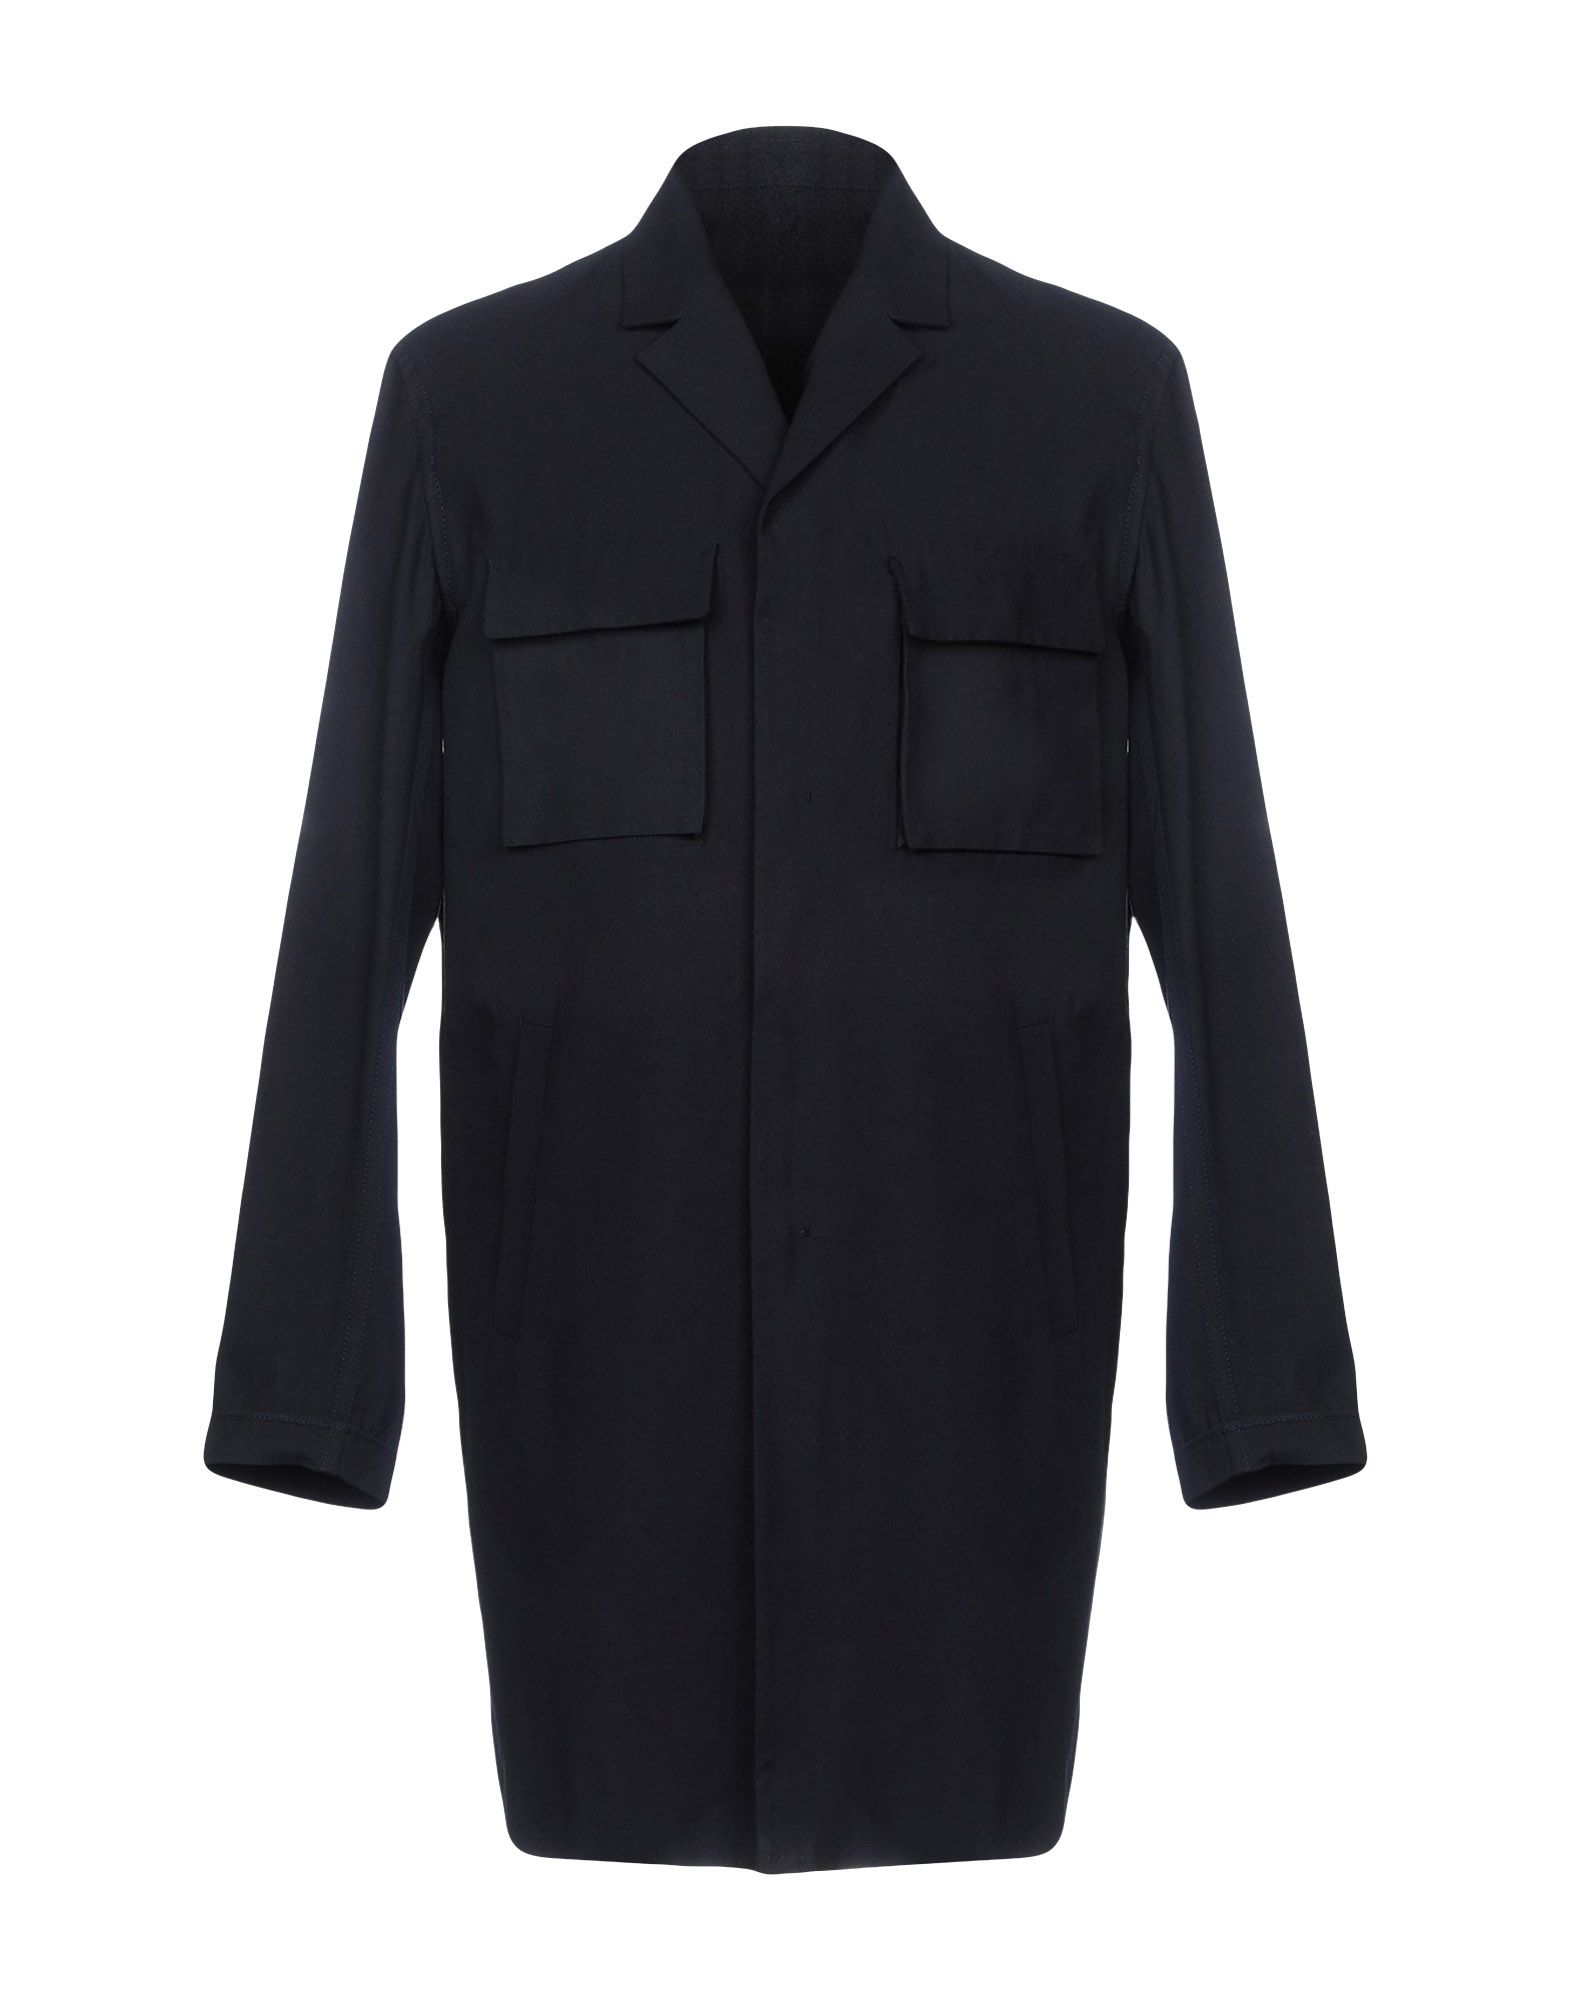 PLAC Full-Length Jacket in Dark Blue